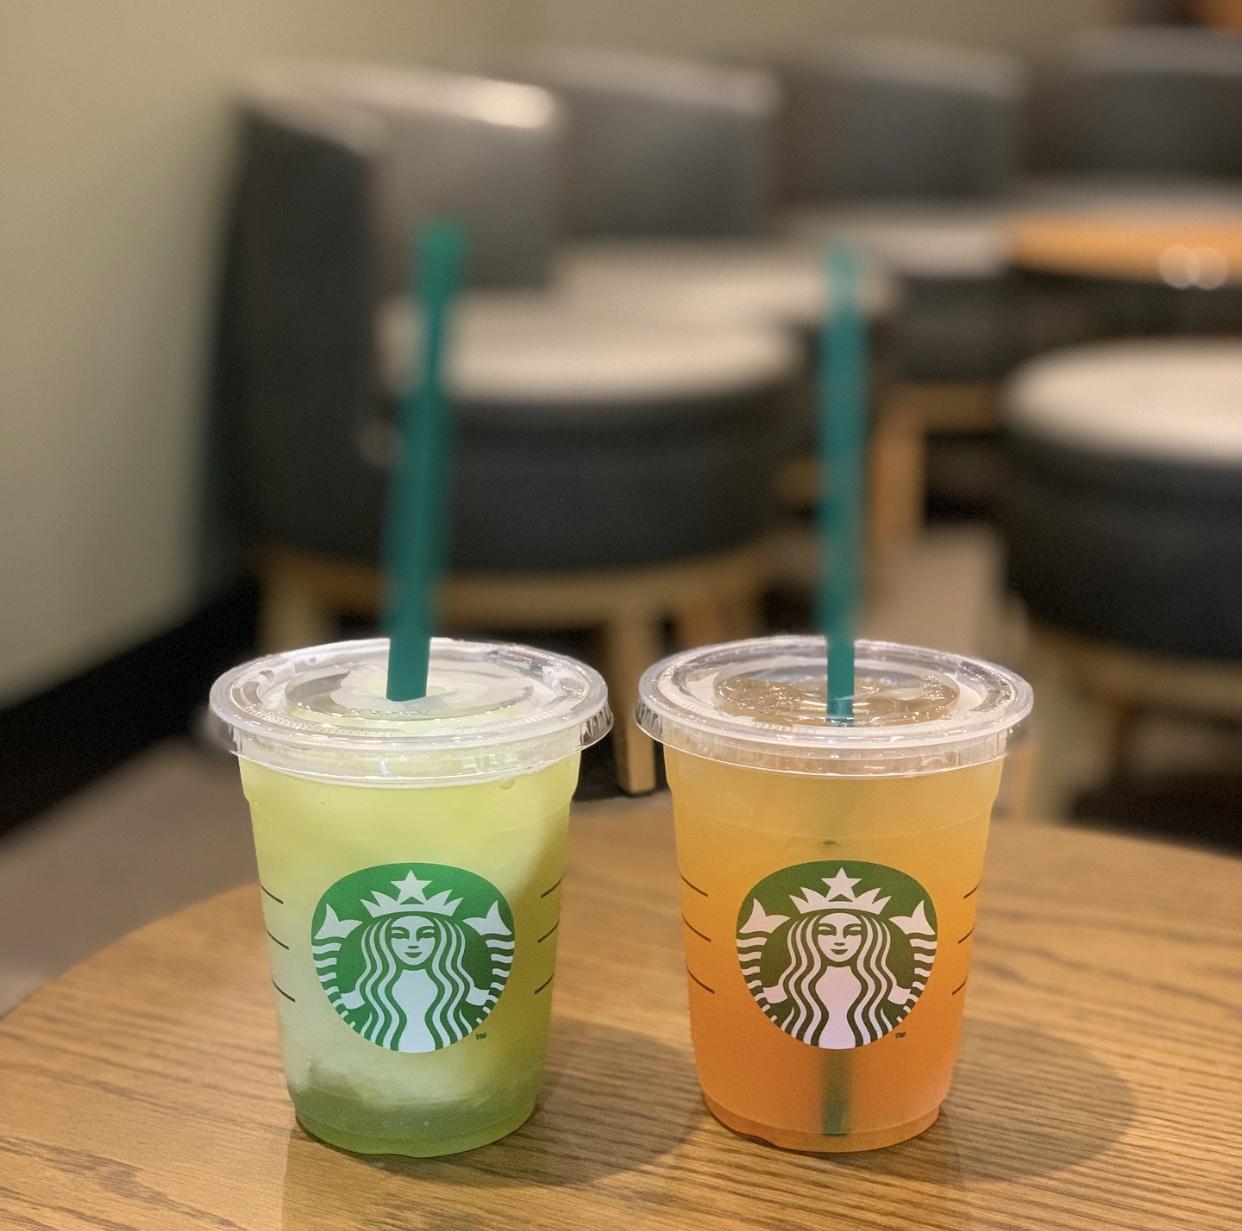 【STARBUCKS】お気に入りはこの2つ!!夏の楽しみ味わって来ました⑅*.♡_1